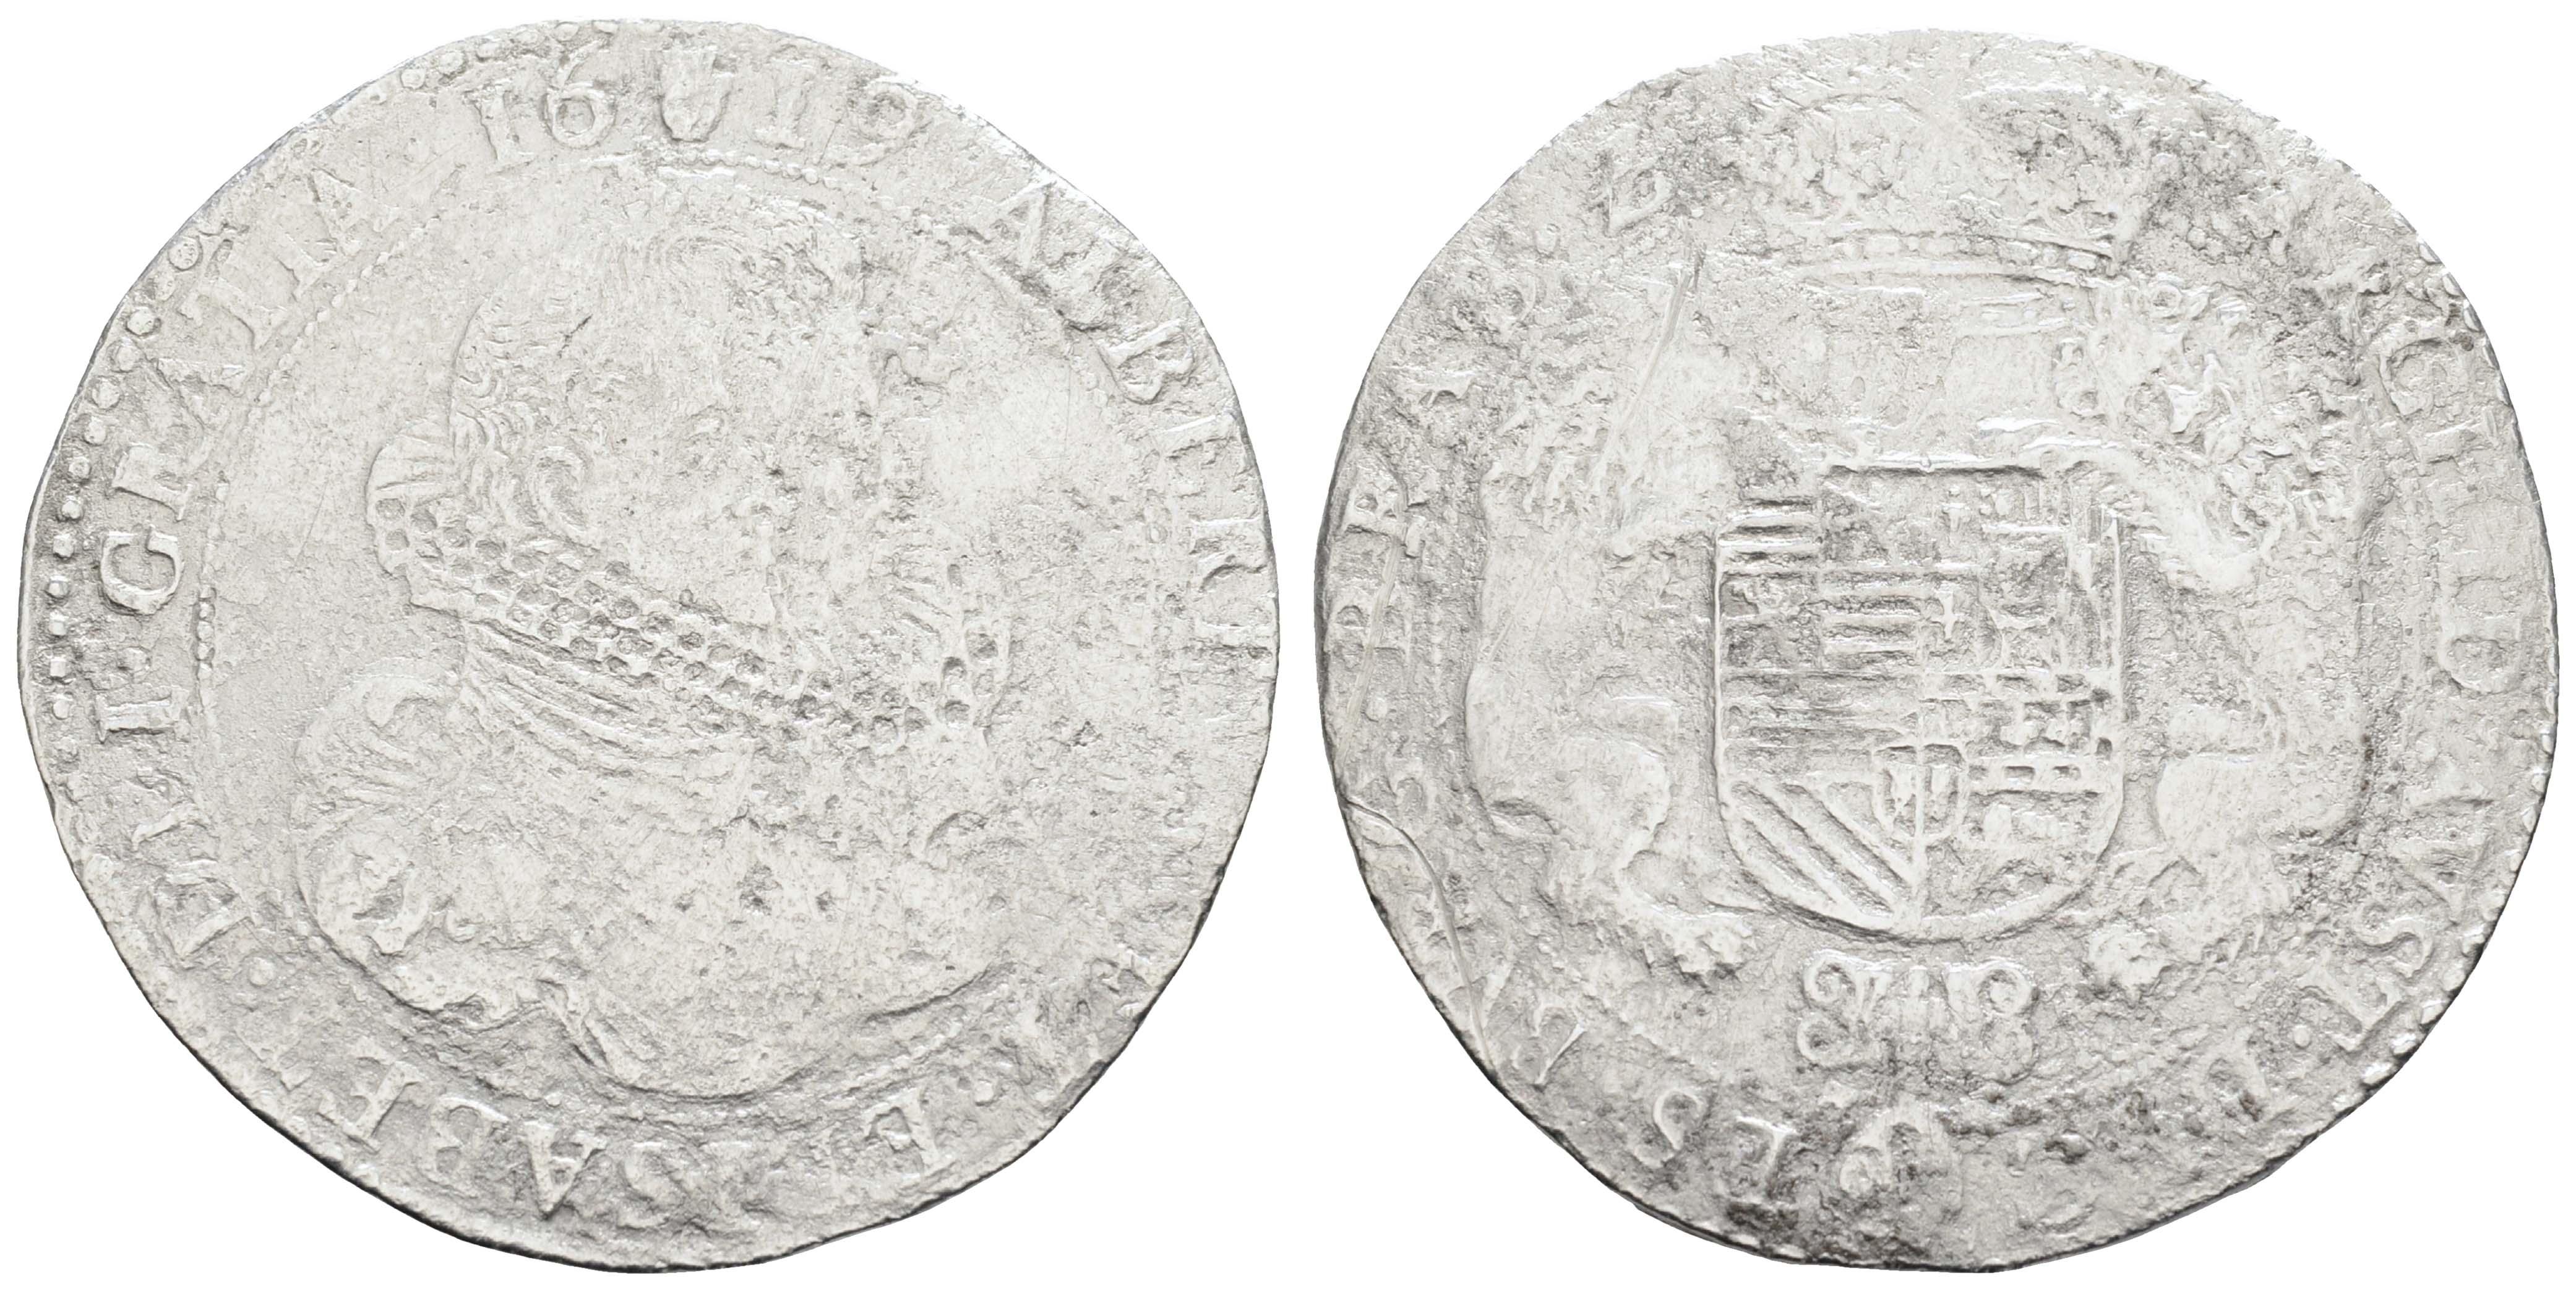 Lot 929 - Europa bis 1799 Belgien  -  Auktionshaus Ulrich Felzmann GmbH & Co. KG Auction 169